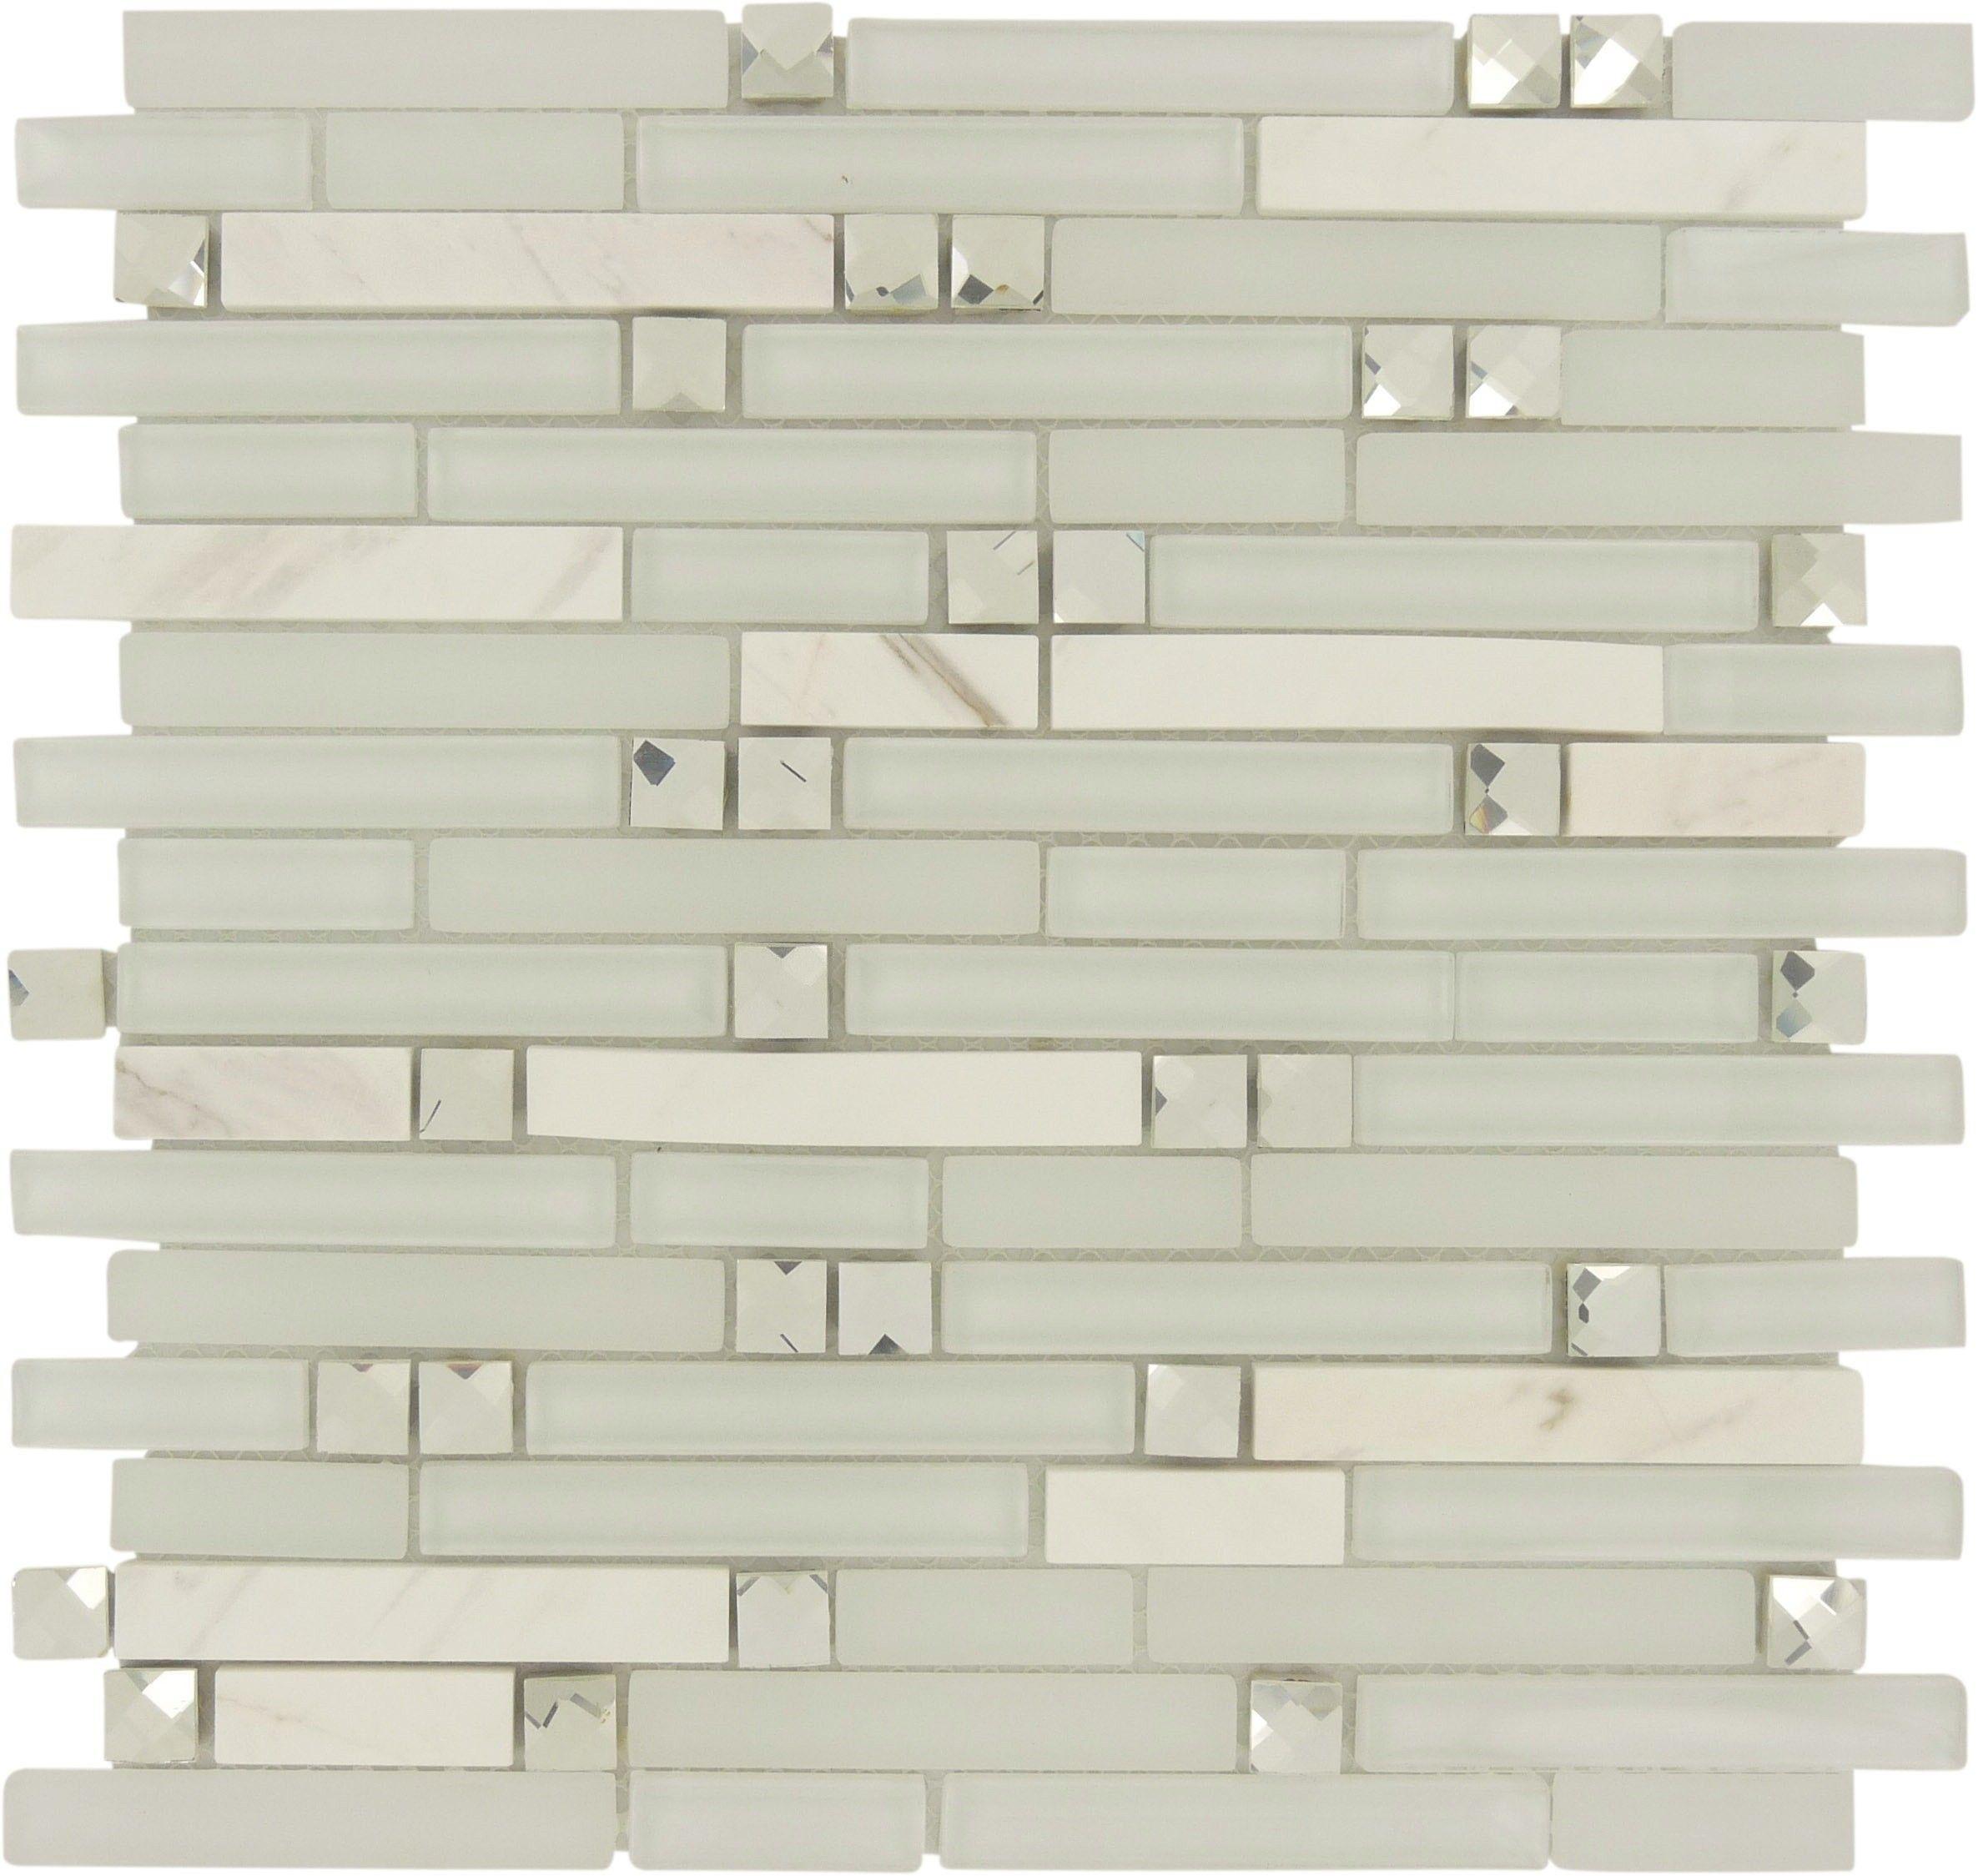 Sheet Size: 1 Sq. Ft. Tile Size: Random Bricks Tiles Per